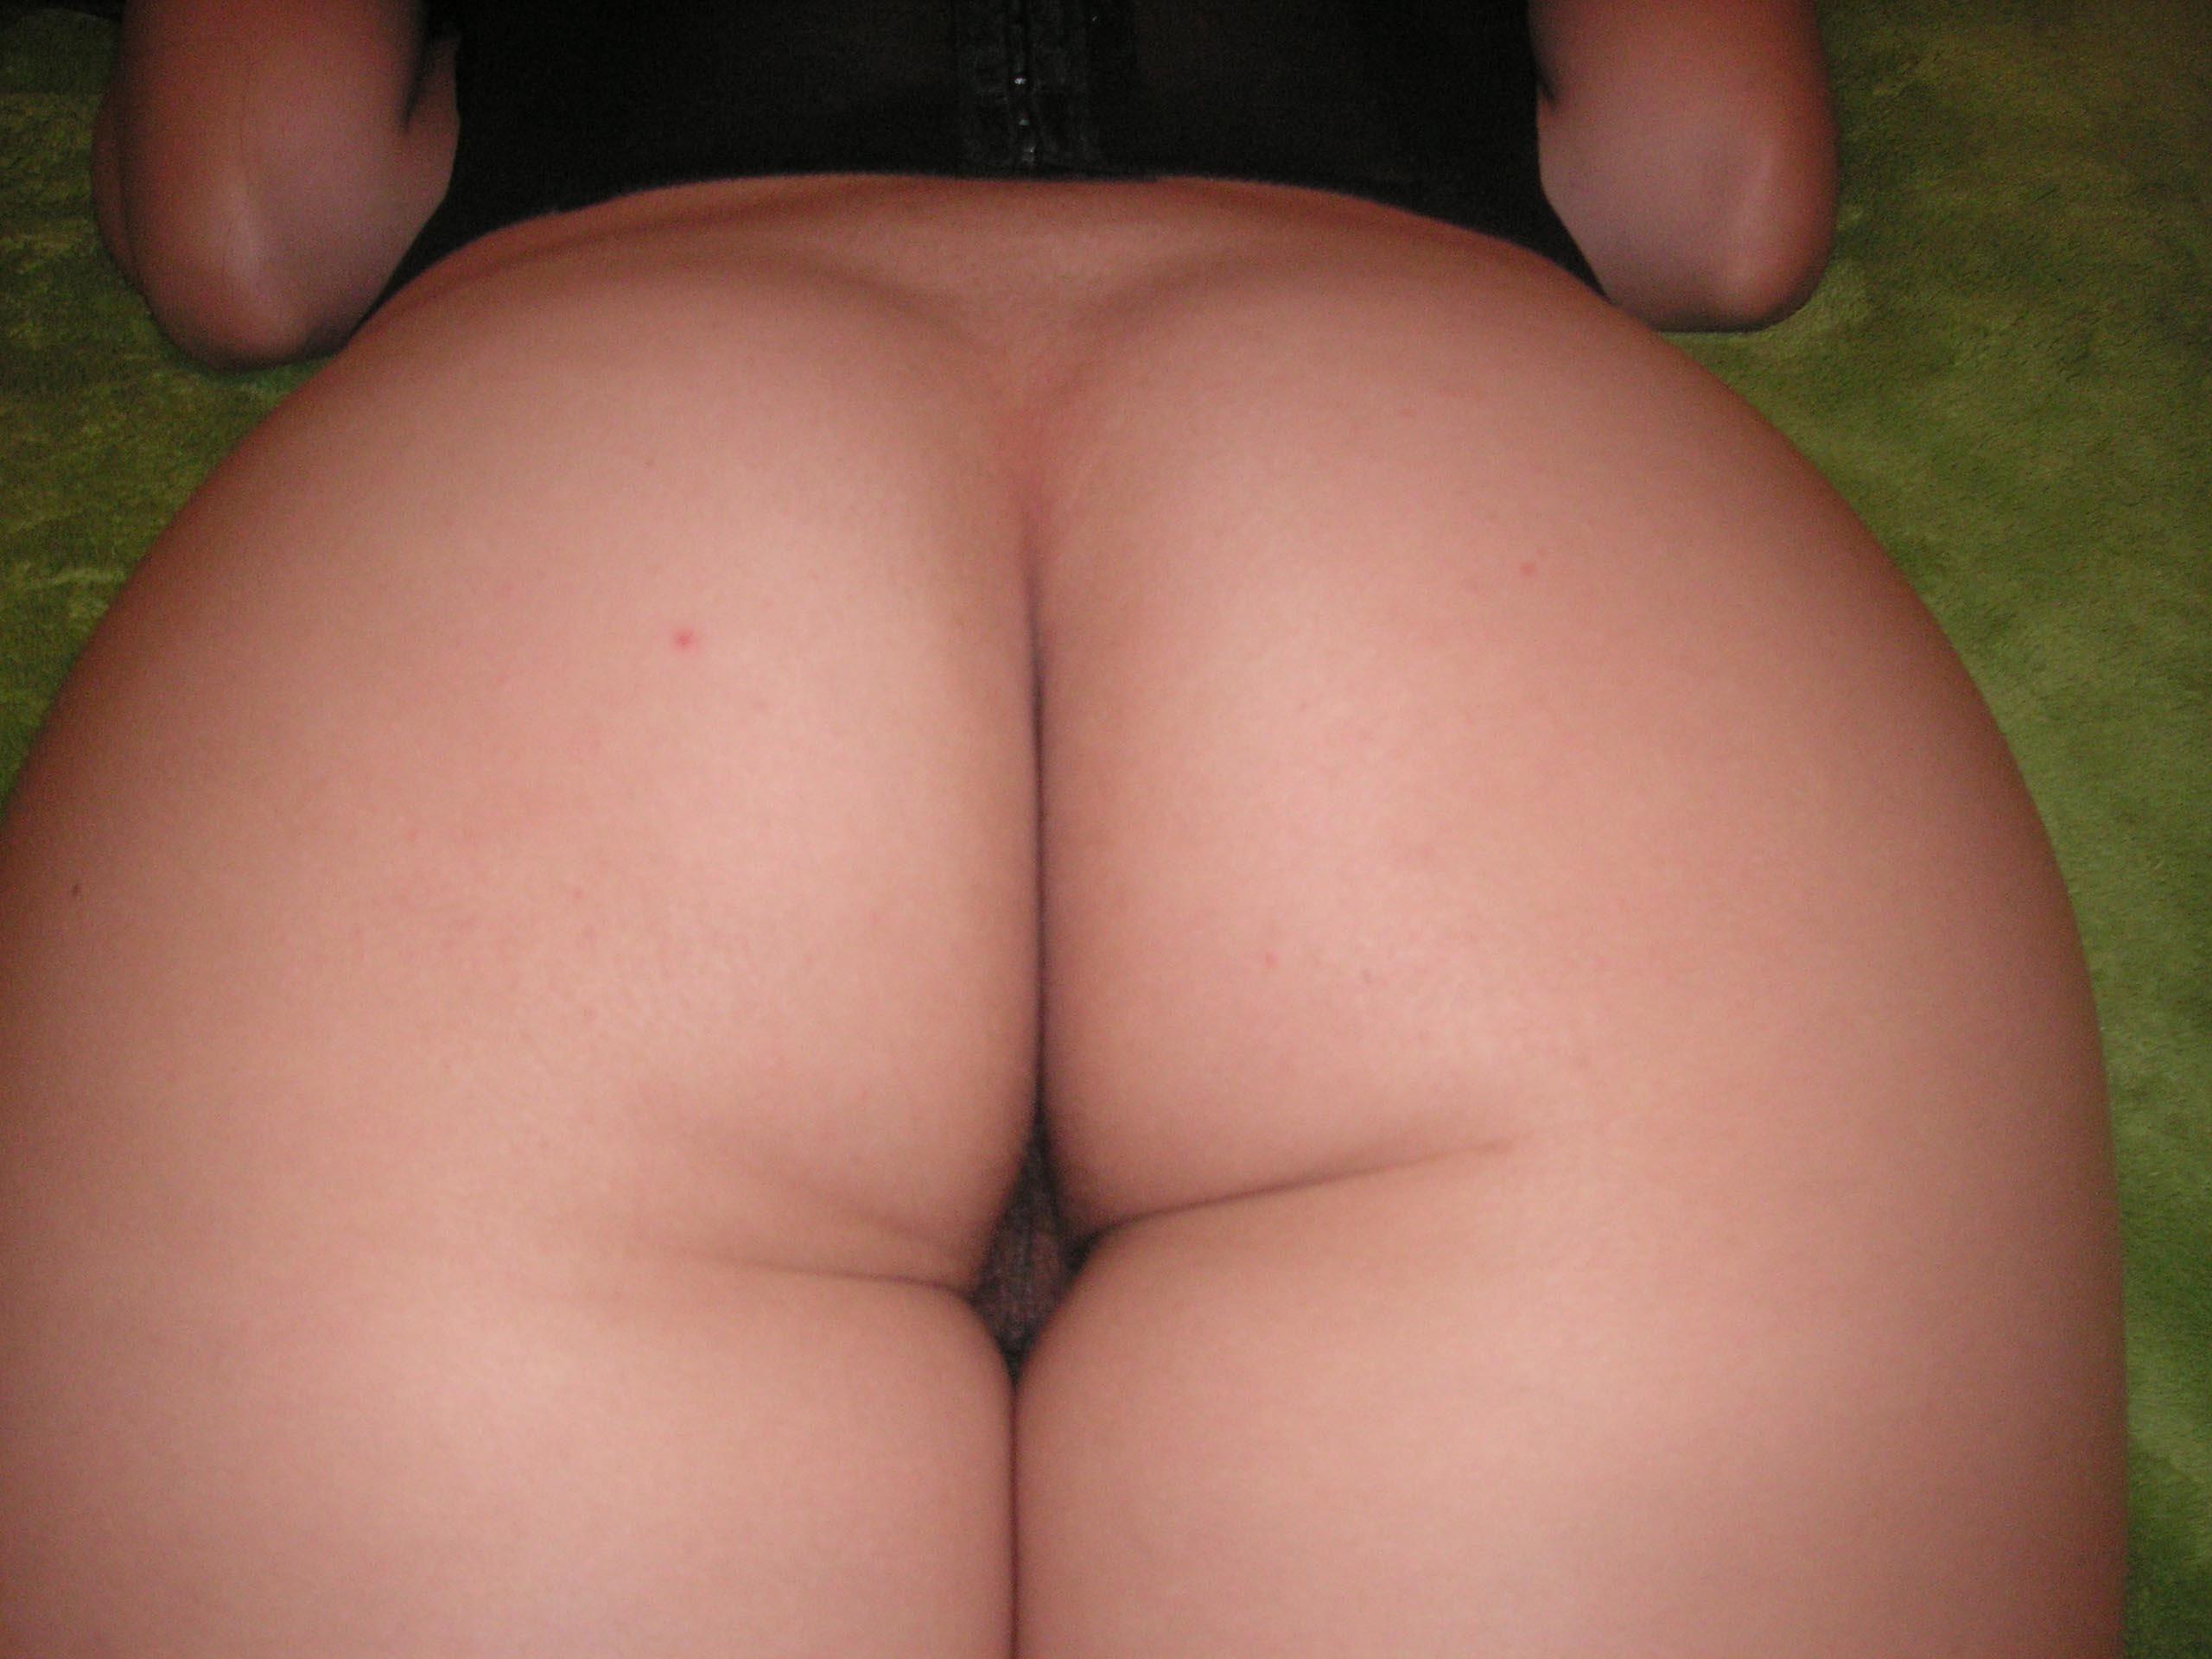 marissa cosmid butt   sex porn images